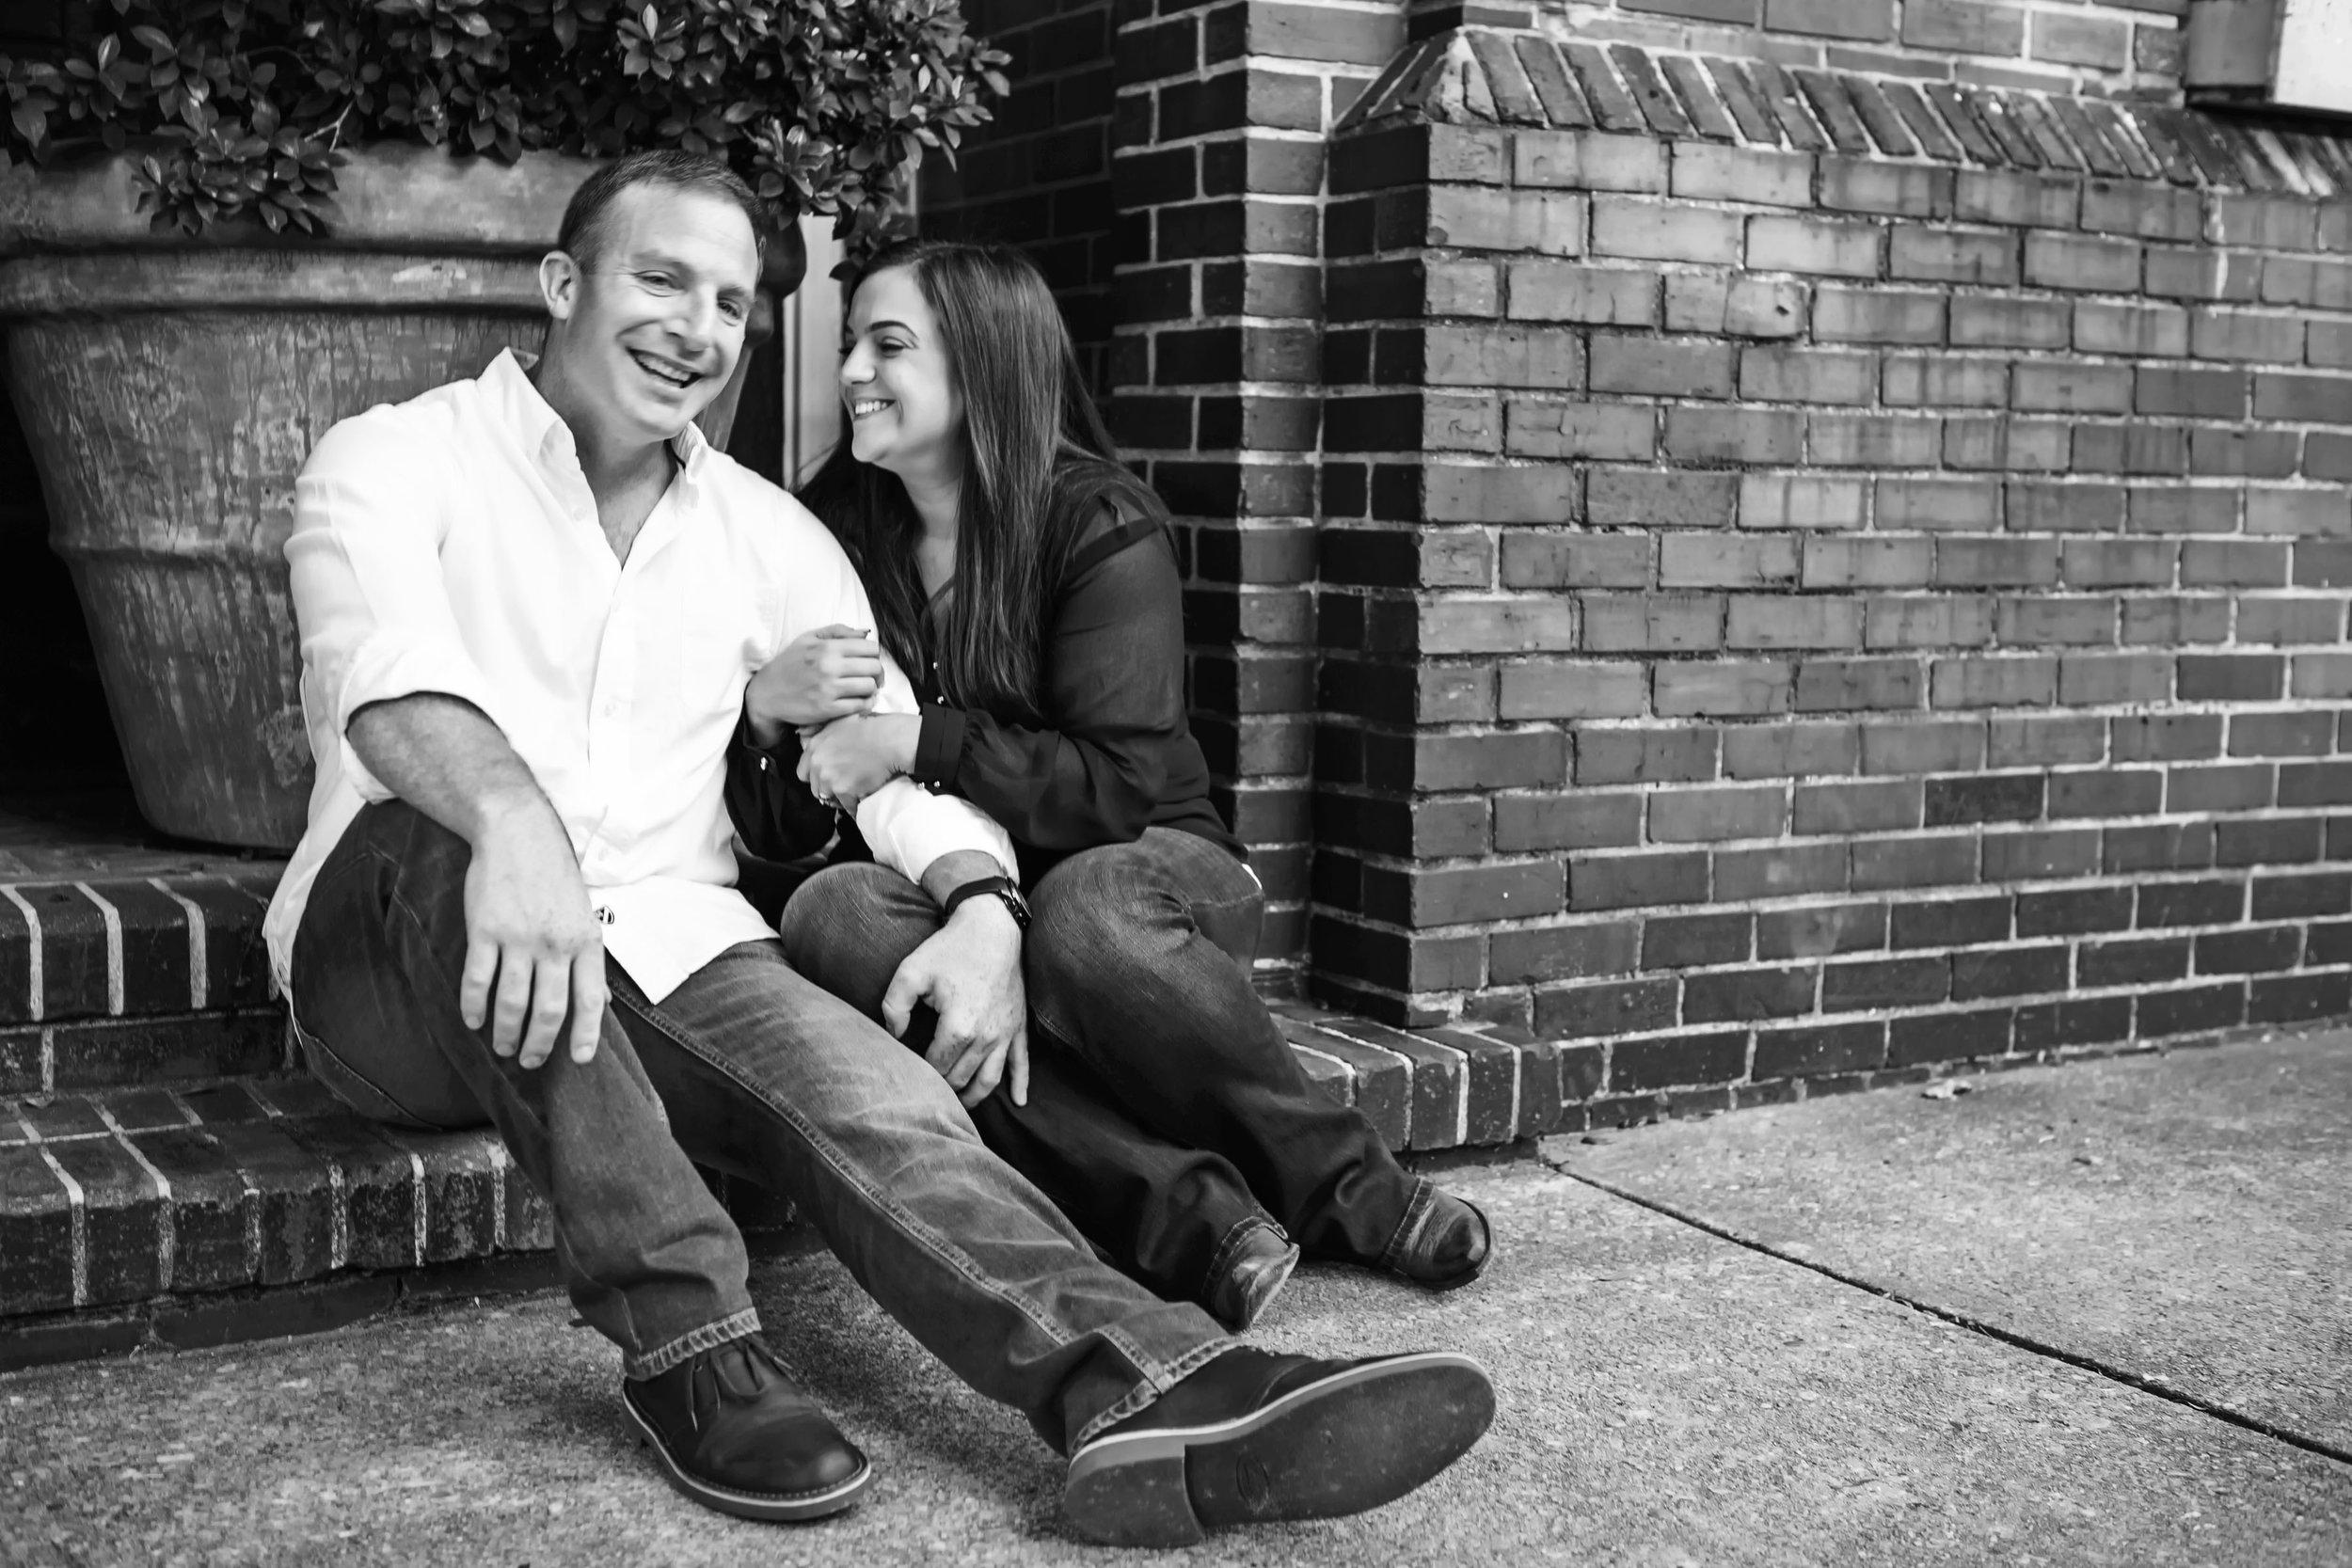 Wilmington_NC_Photographer_Tiffany_Abruzzo_Photography_Engagement_13.jpg